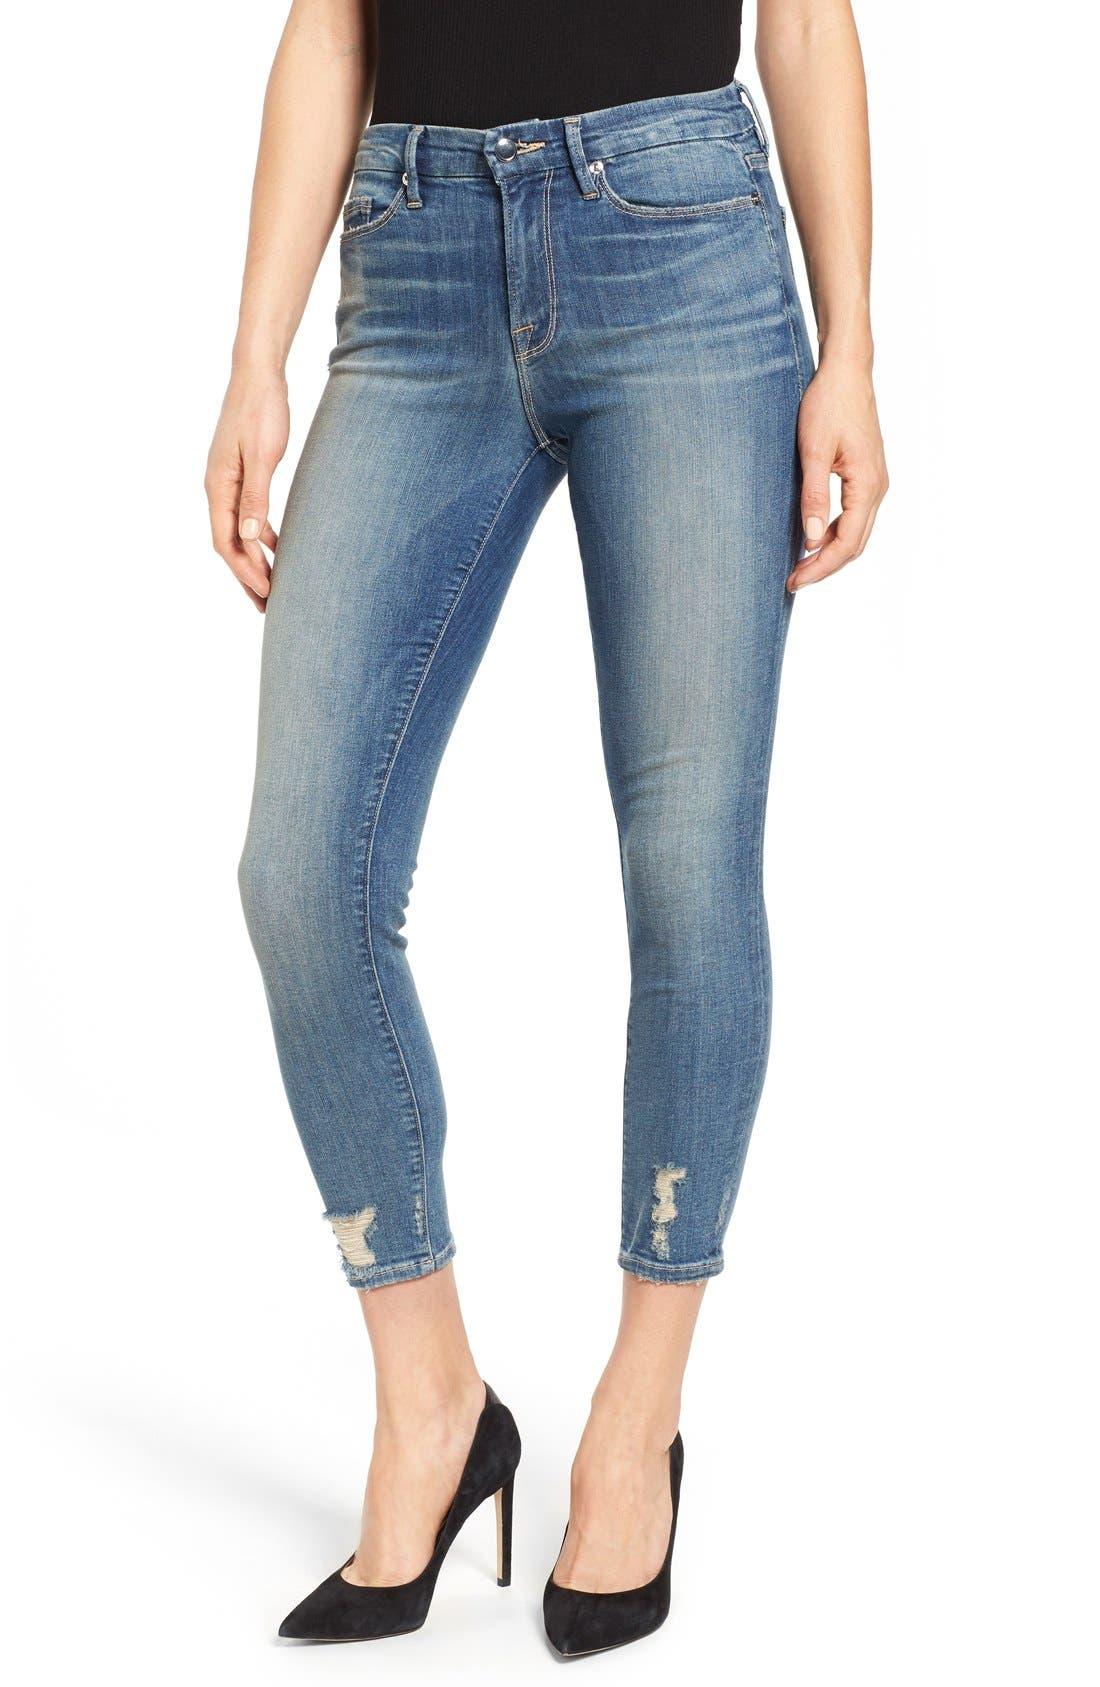 Alternate Image 1 Selected - Good American Good Legs High Rise Crop Skinny Jeans